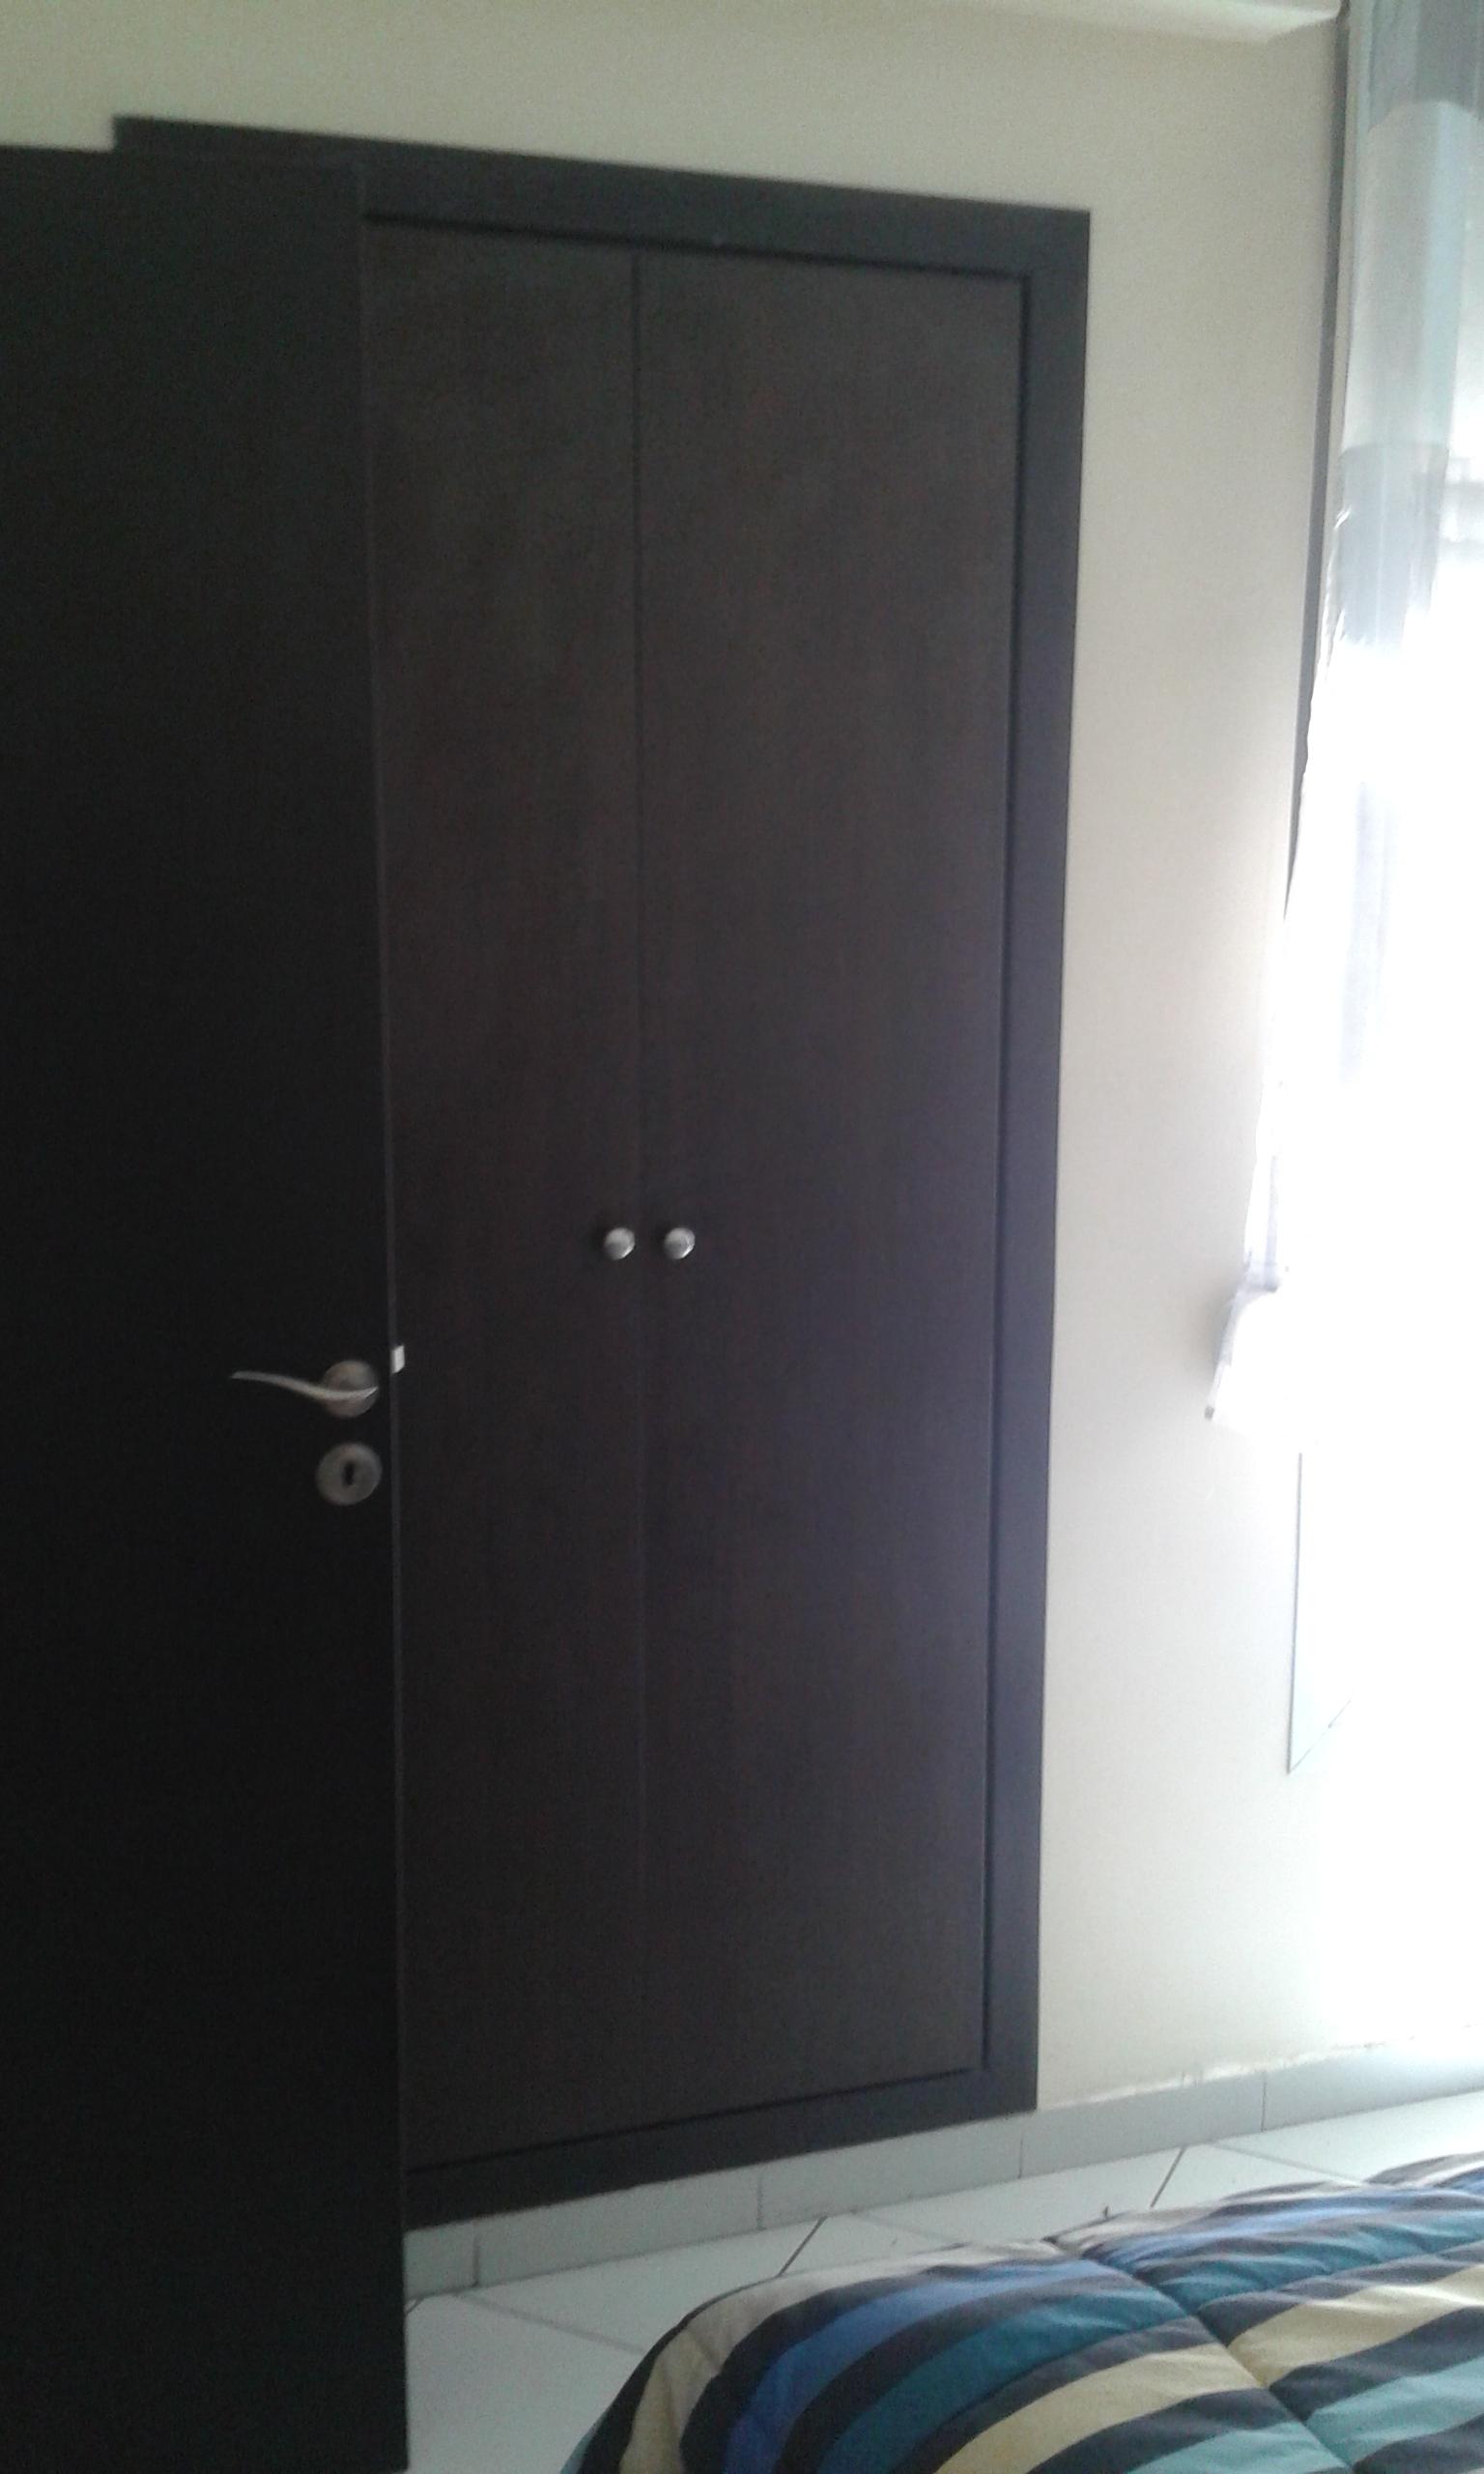 Image belle studio meublé wifi ascenseur parking ain sebaa casablanca maroc 30